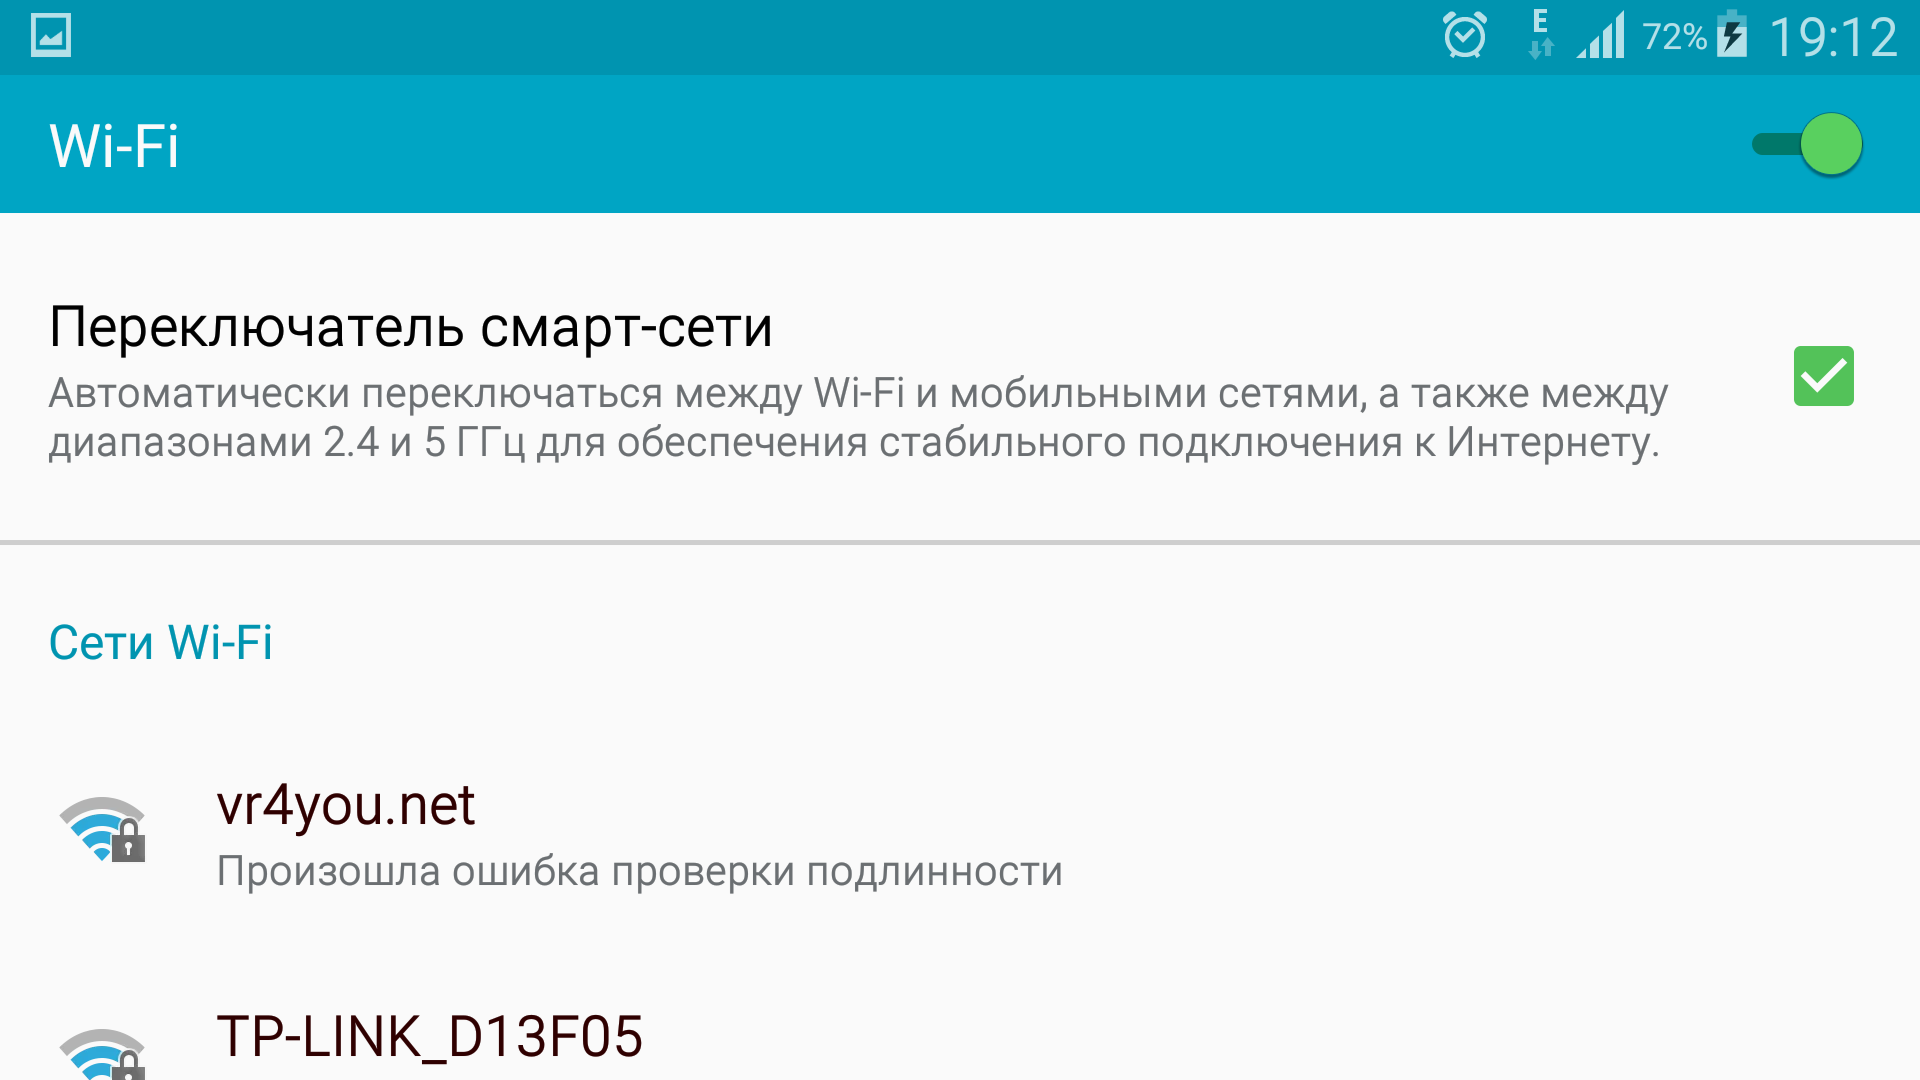 Исправляем ошибку аутентификации wi-fi на android